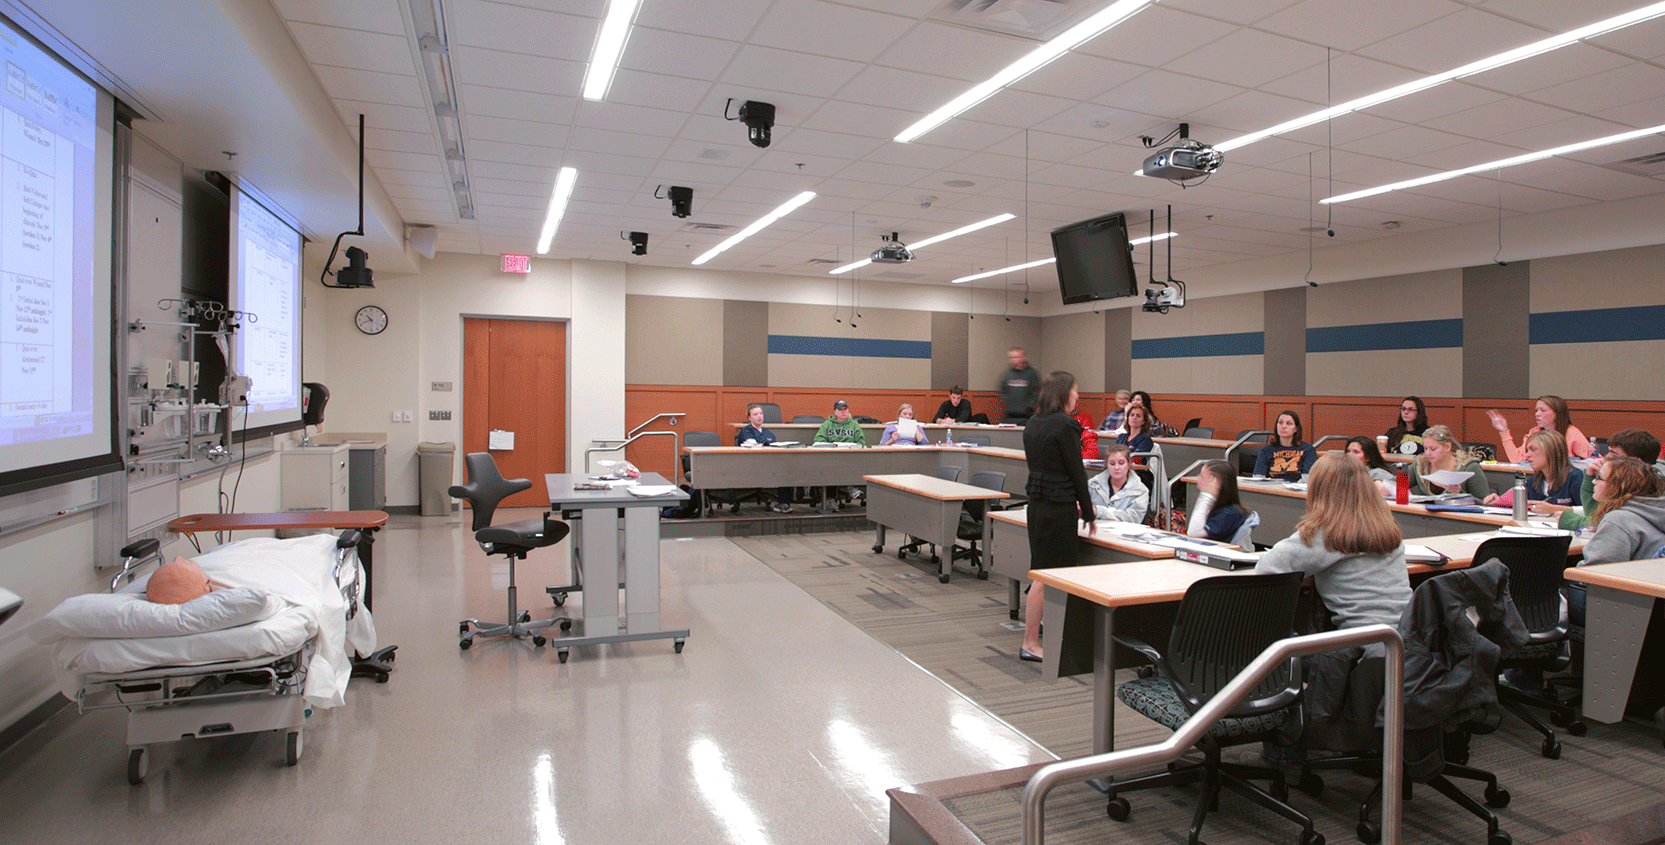 SVSU-CHHS-Classroom-1665x845